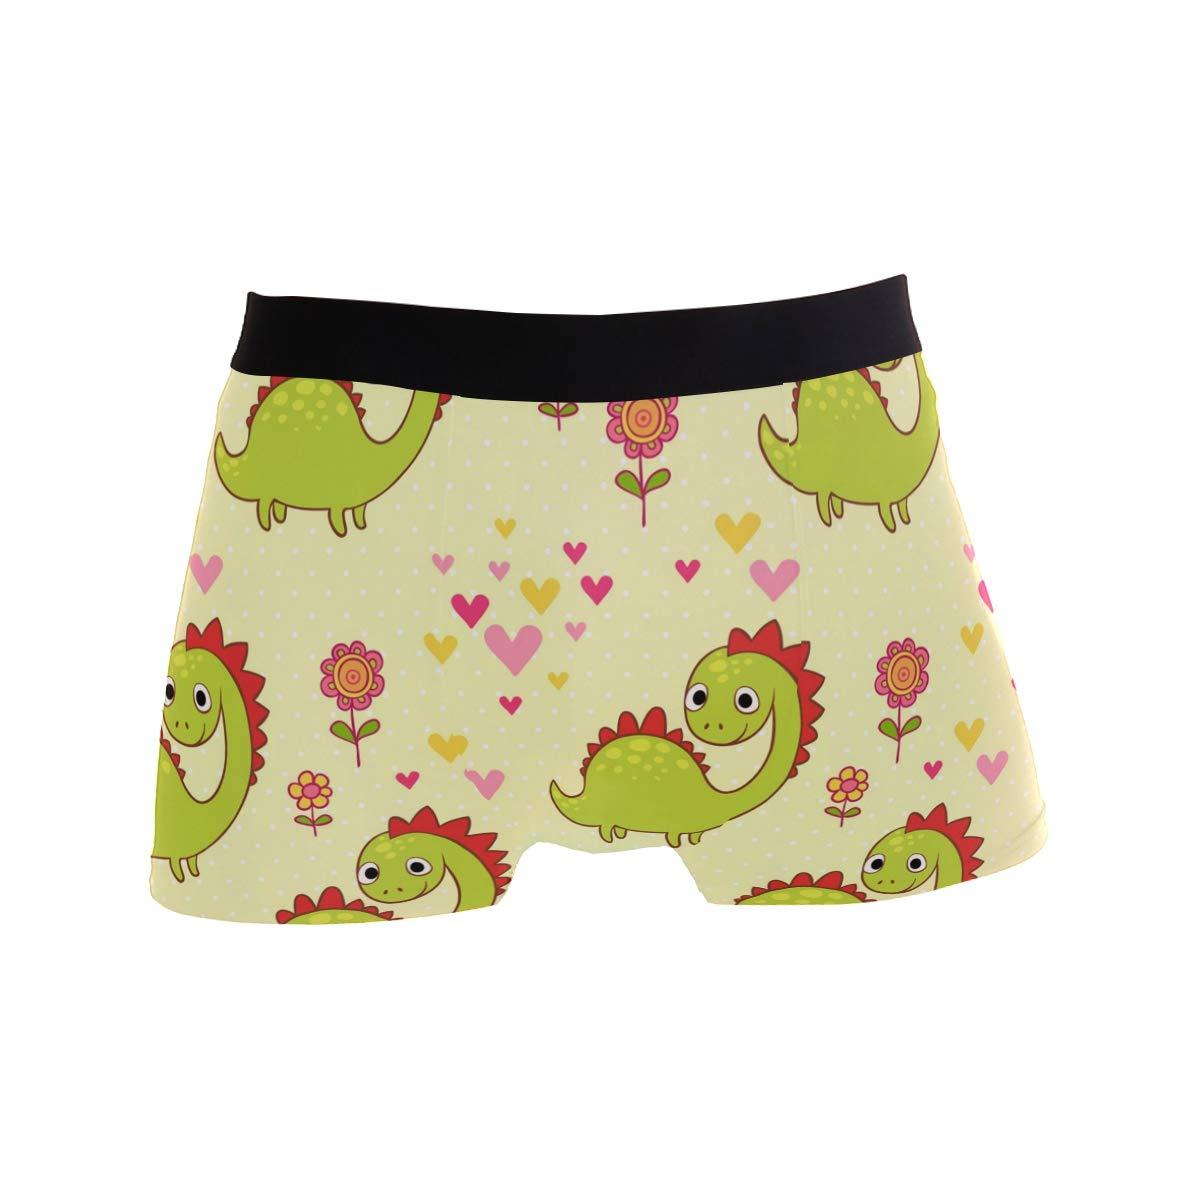 WIHVE Mens Boxer Briefs Cute Cartoon Dinosaurs Flowers Floral Hearts Underwear Regular Leg No Ride Up Trunks